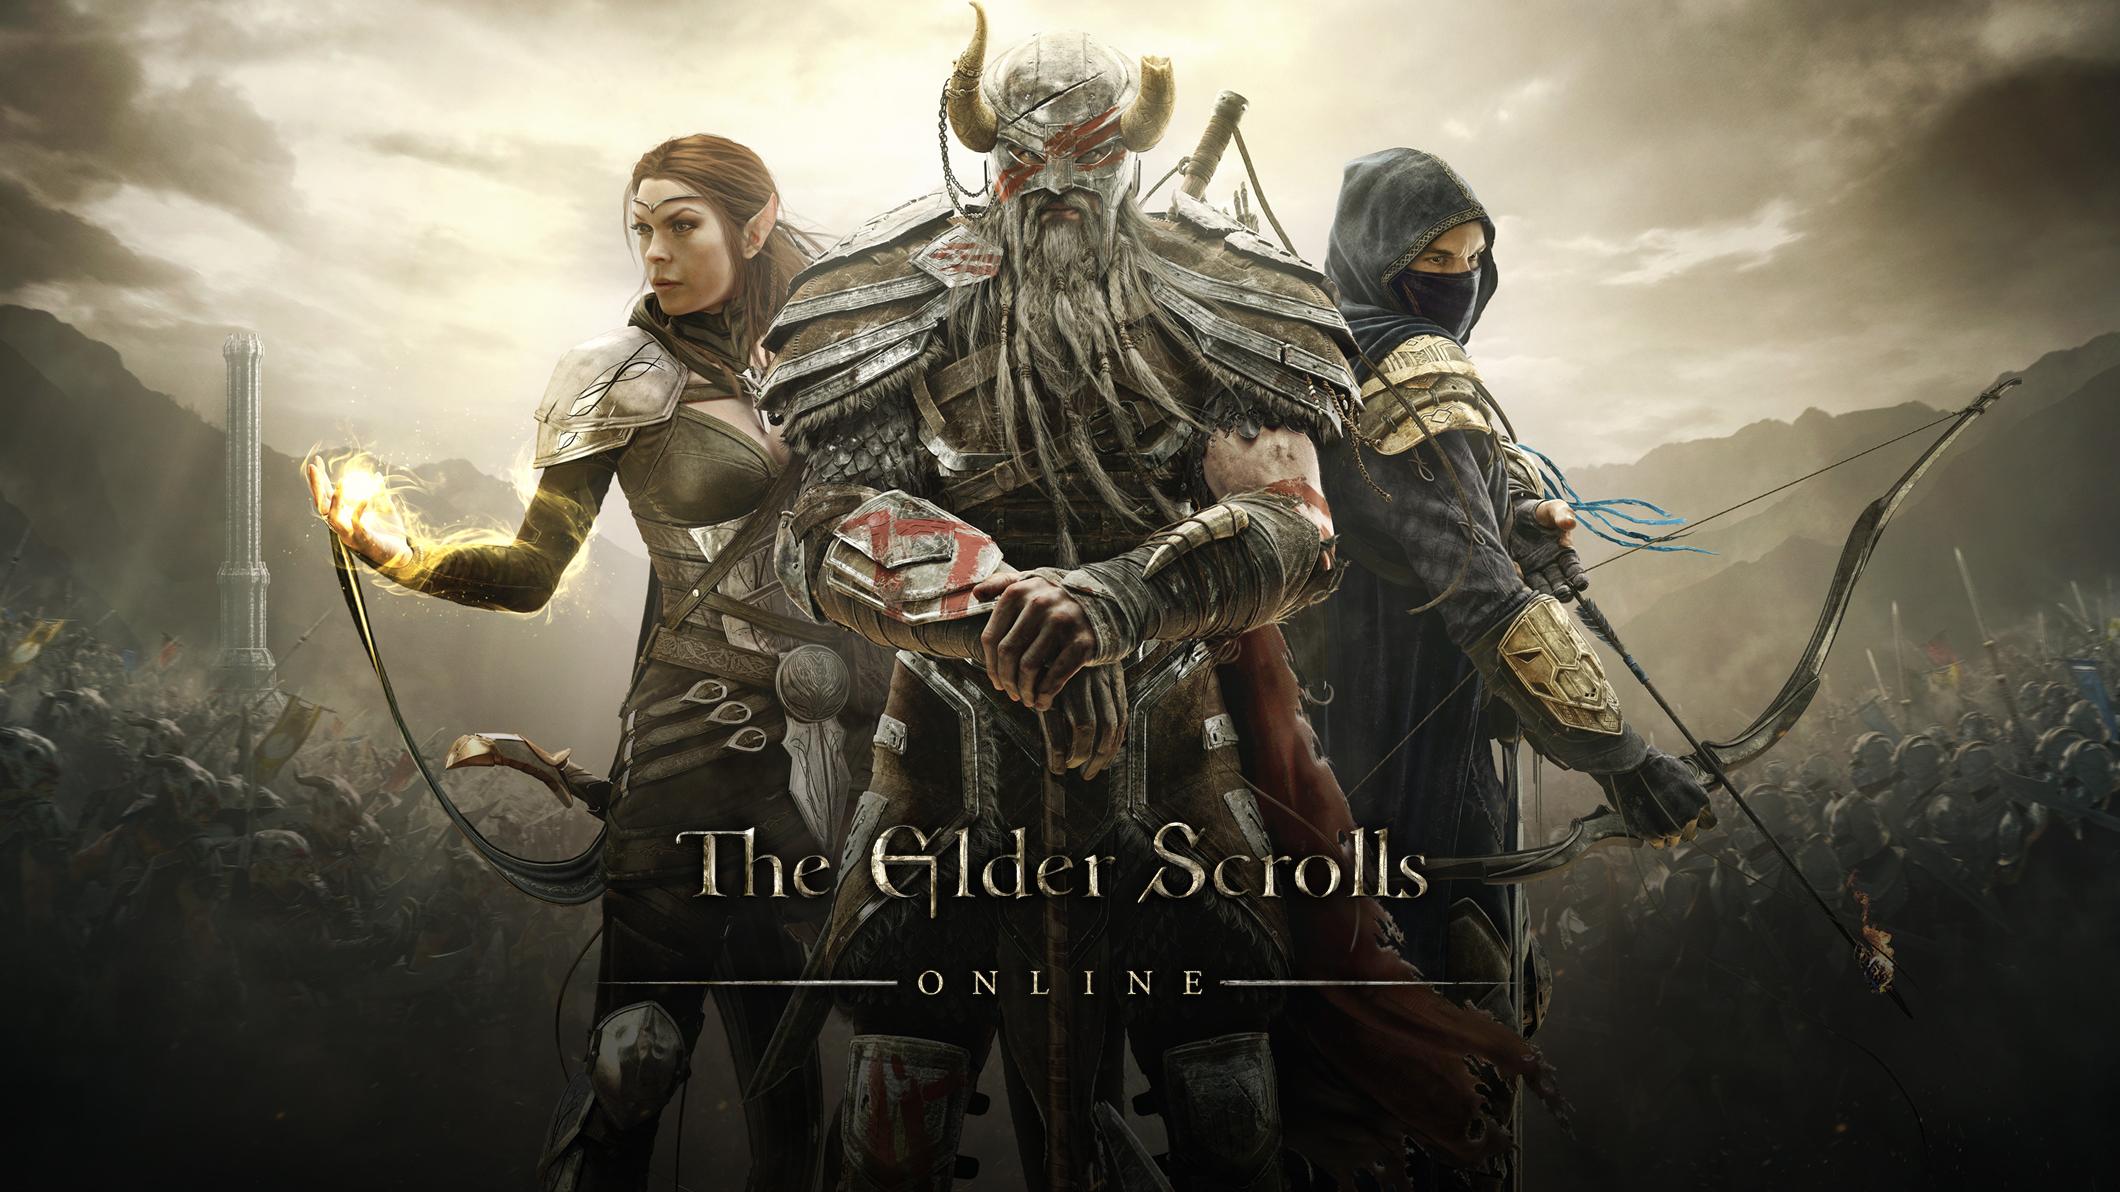 The Elder Scrolls Online Original